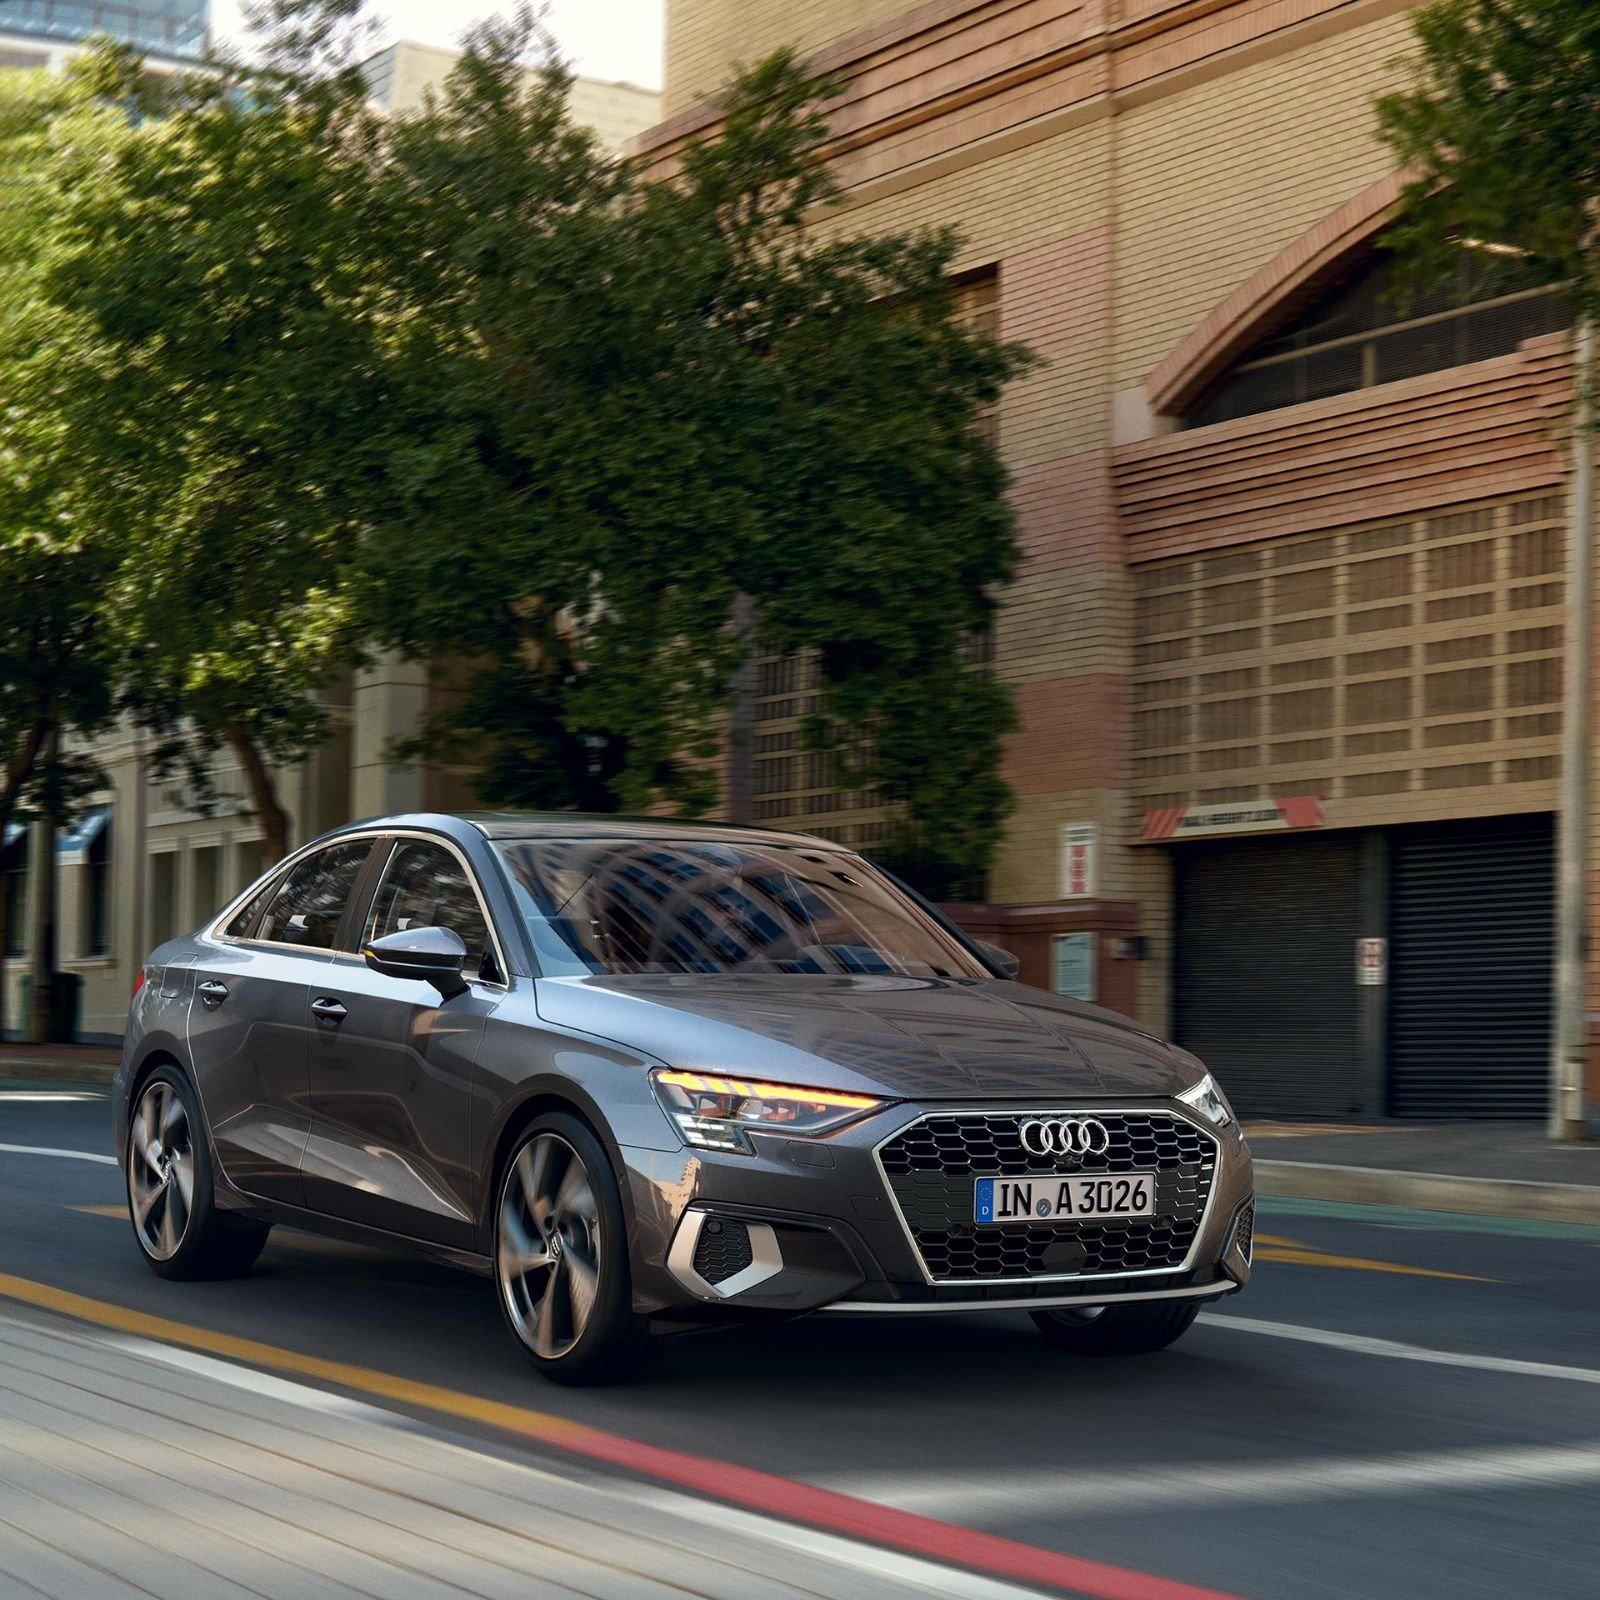 De Nieuwe Audi A3 Limousine In 2020